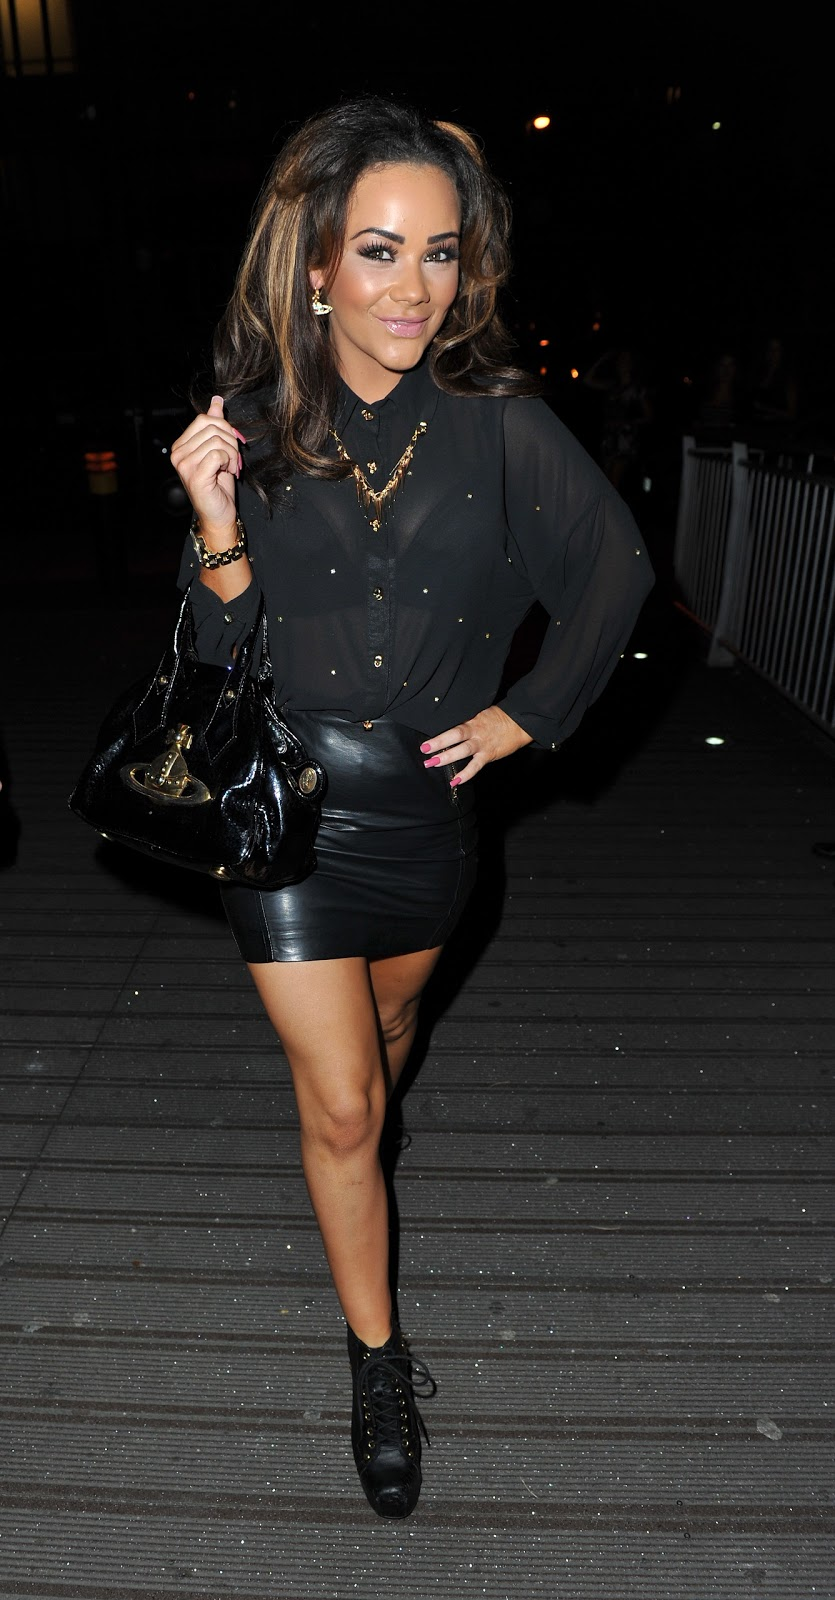 Tight Leather Mini Skirt 86